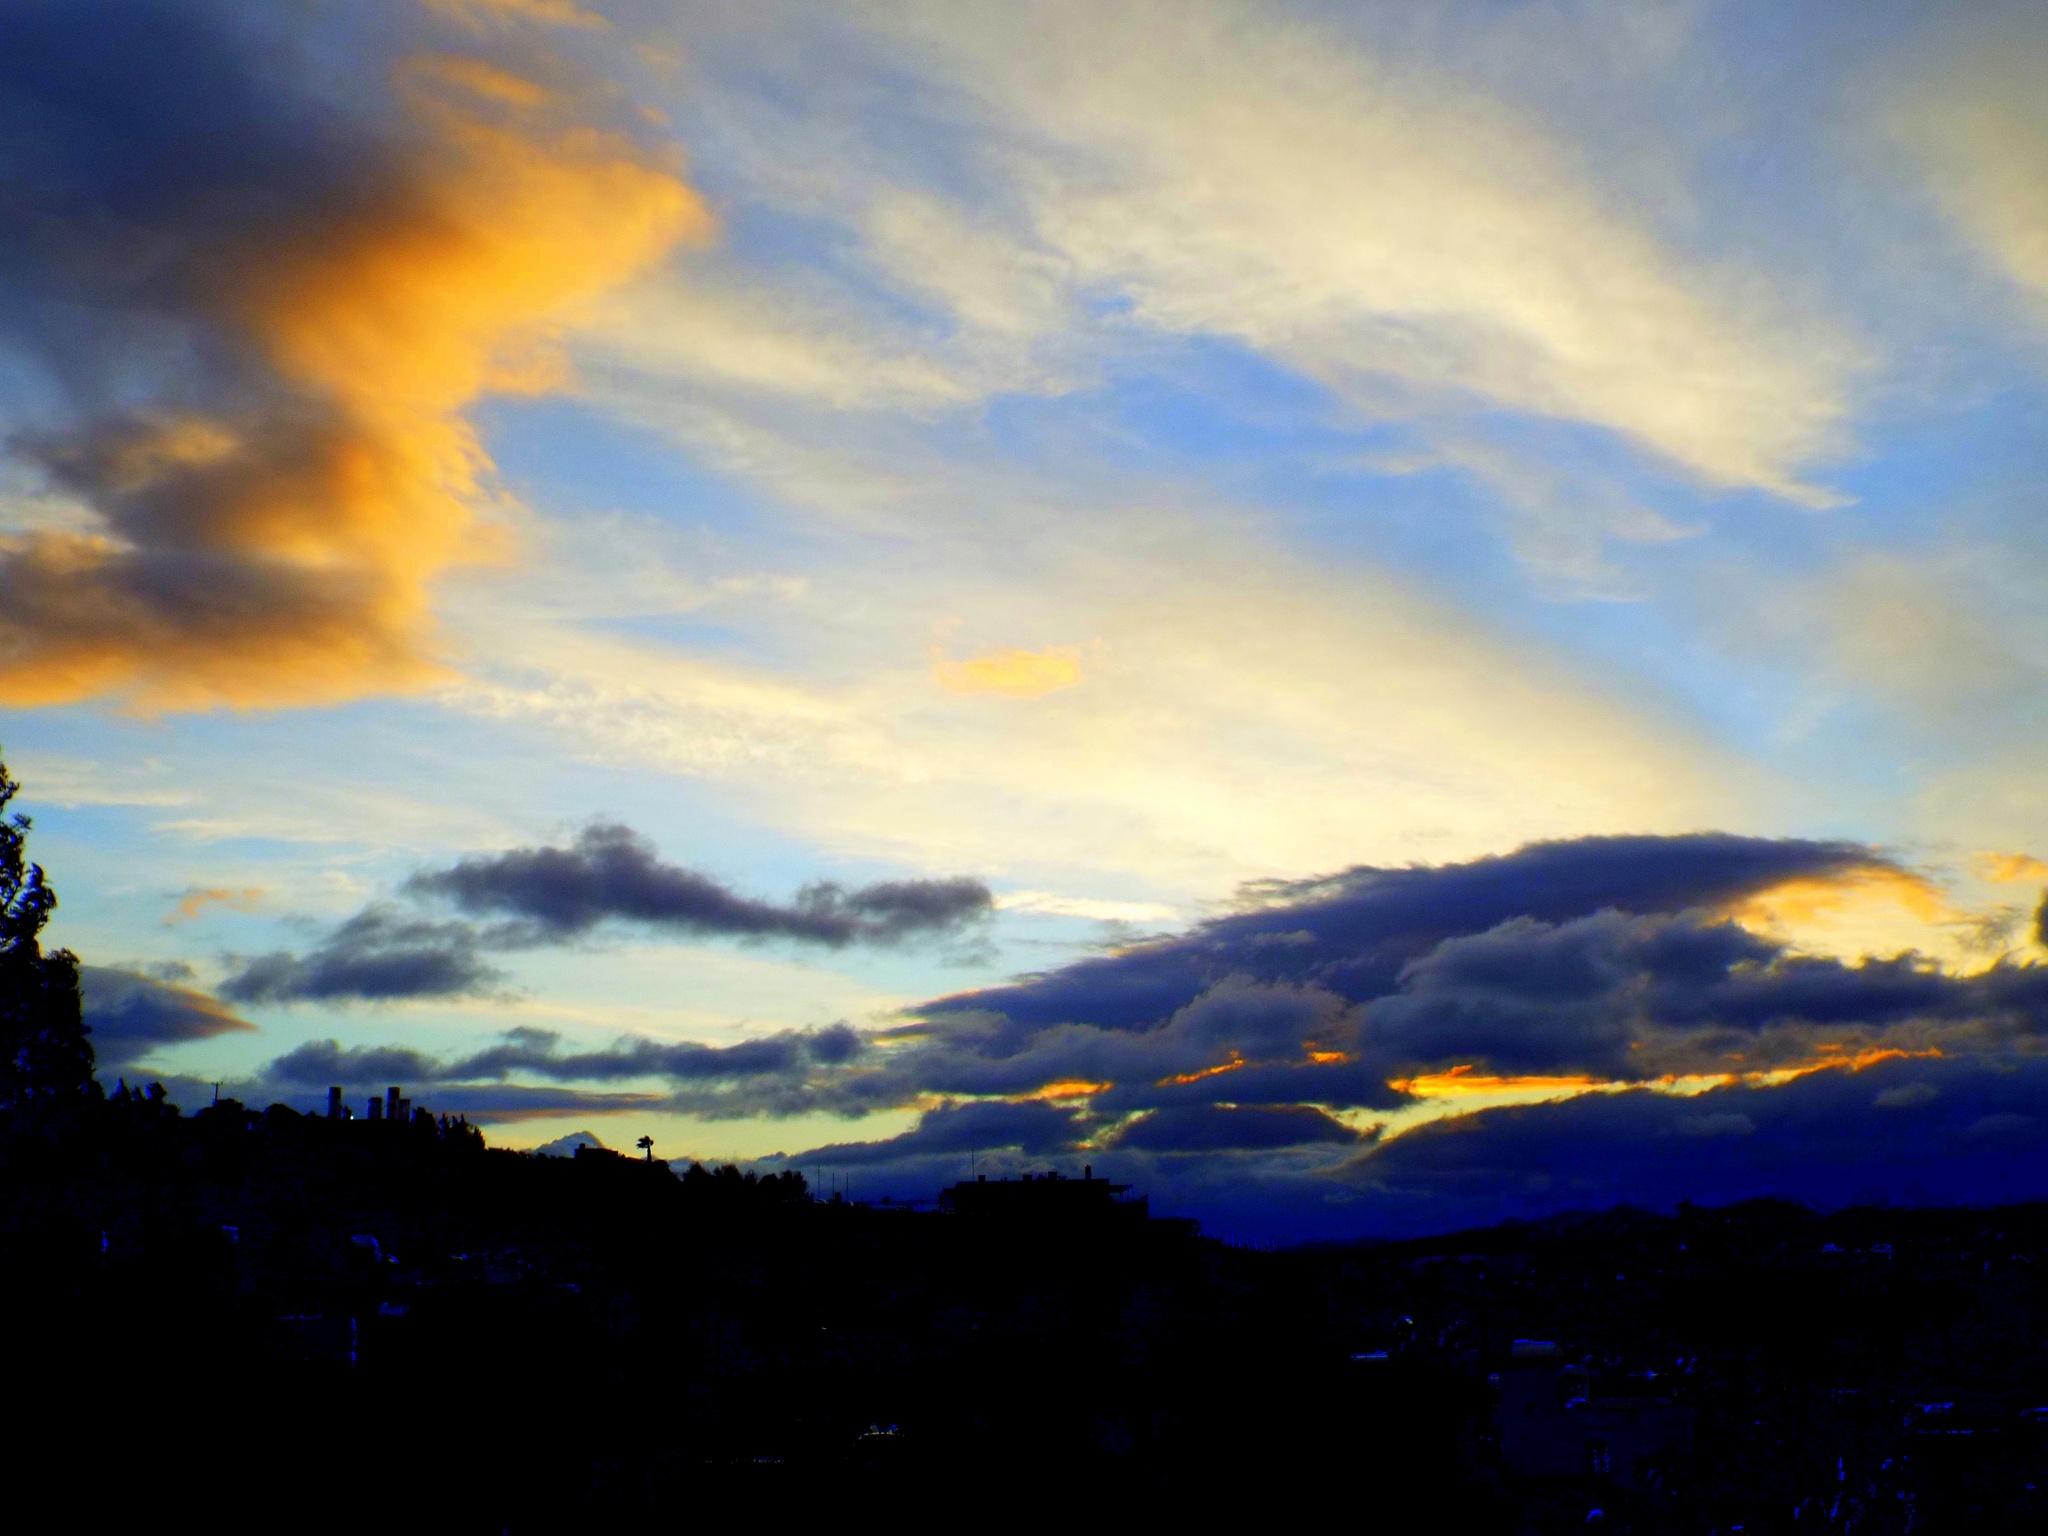 SUNSET FROM MY BALCONY, BITEZ, BODRUM/TURKEY by Akin Saner